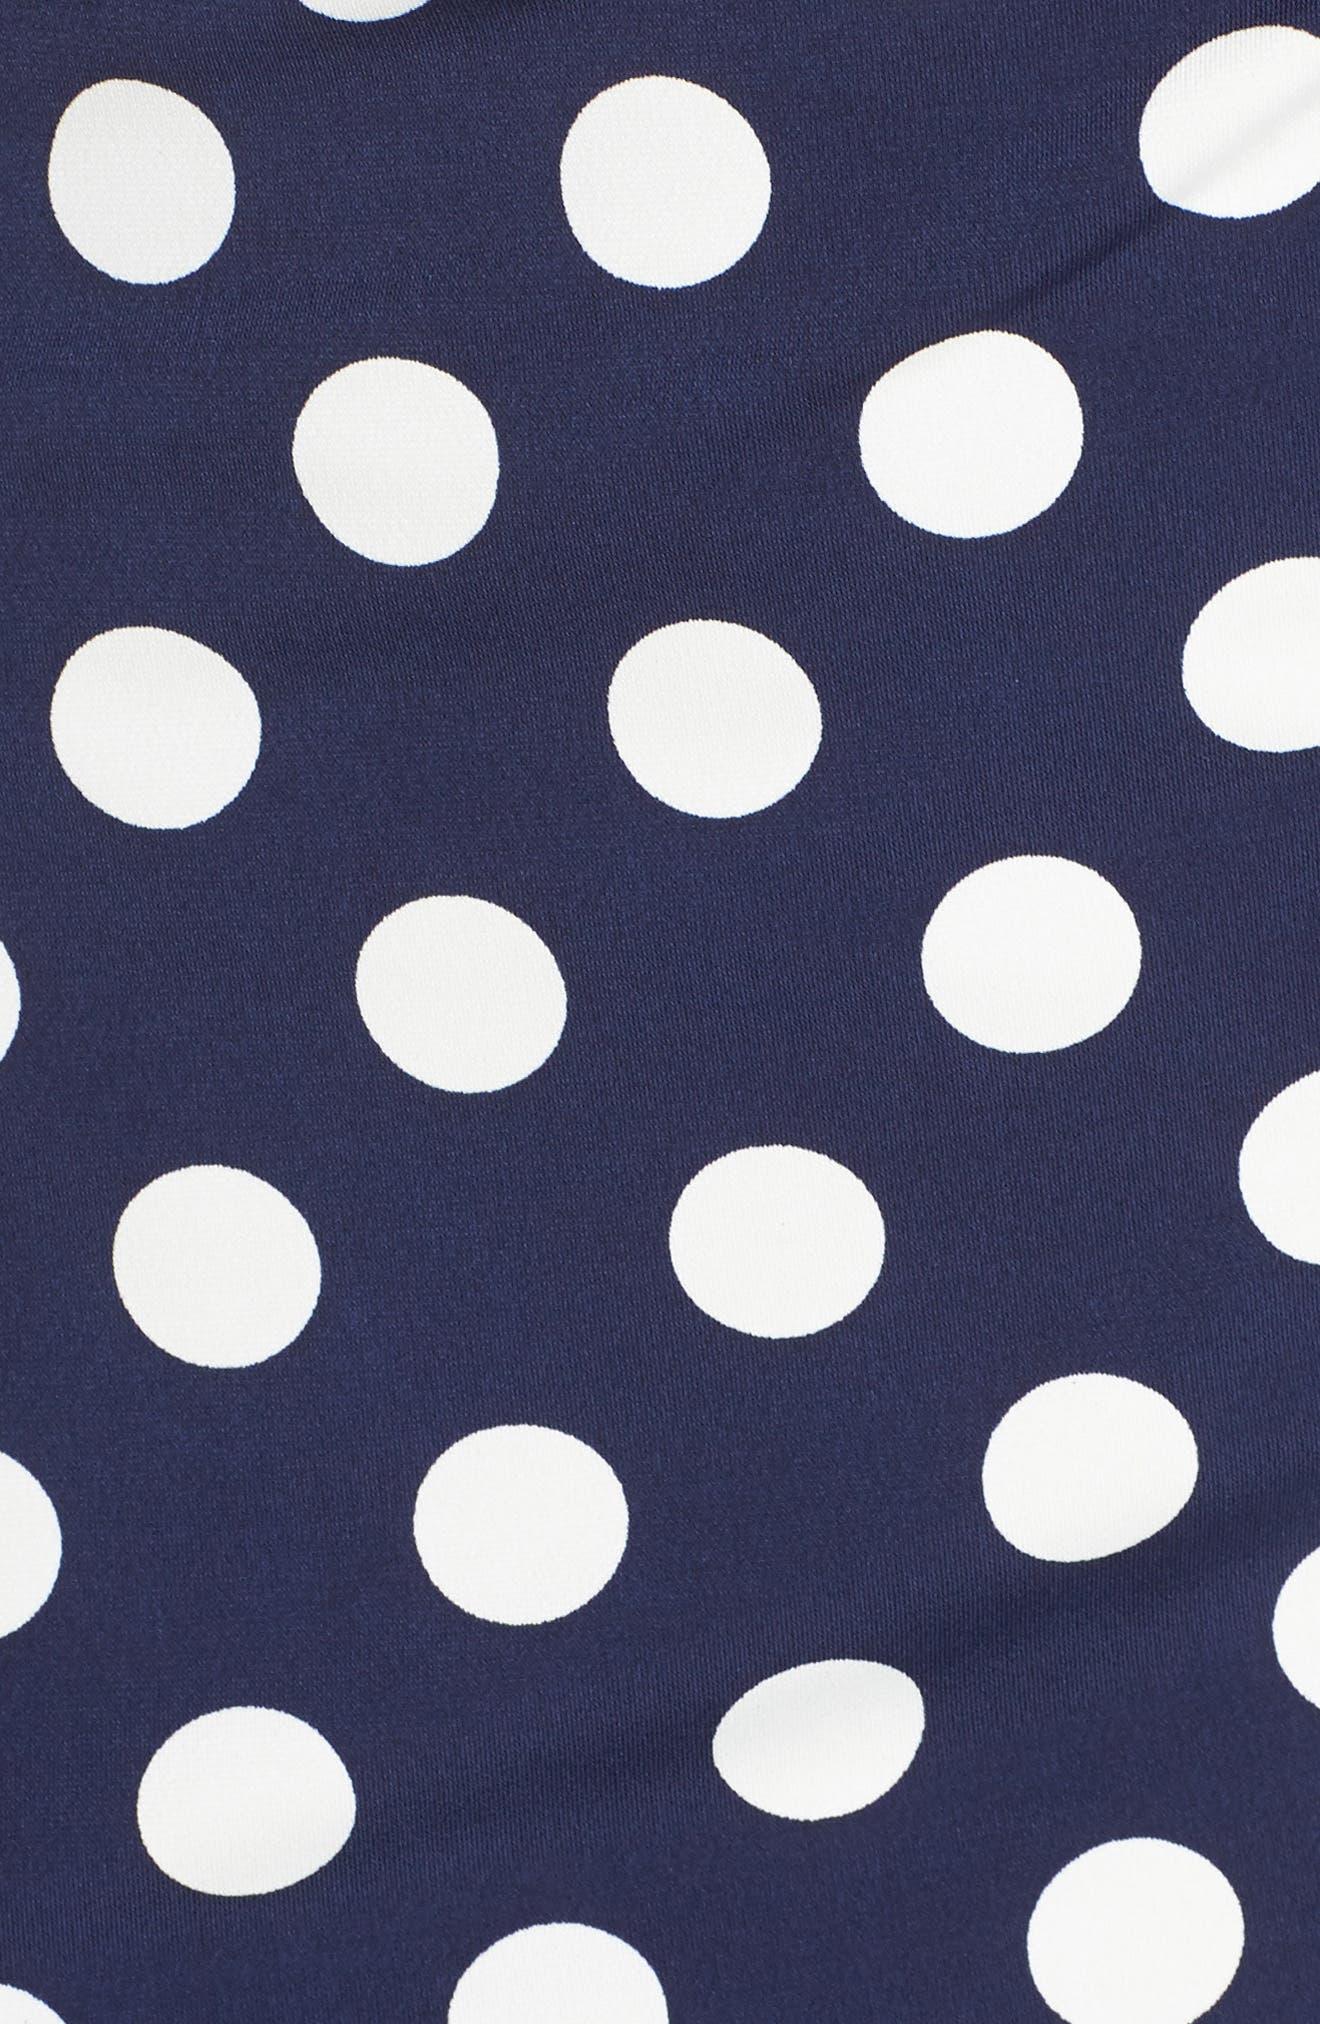 ELIZA J, Polka Dot Side Twist Sheath Dress, Alternate thumbnail 6, color, 407